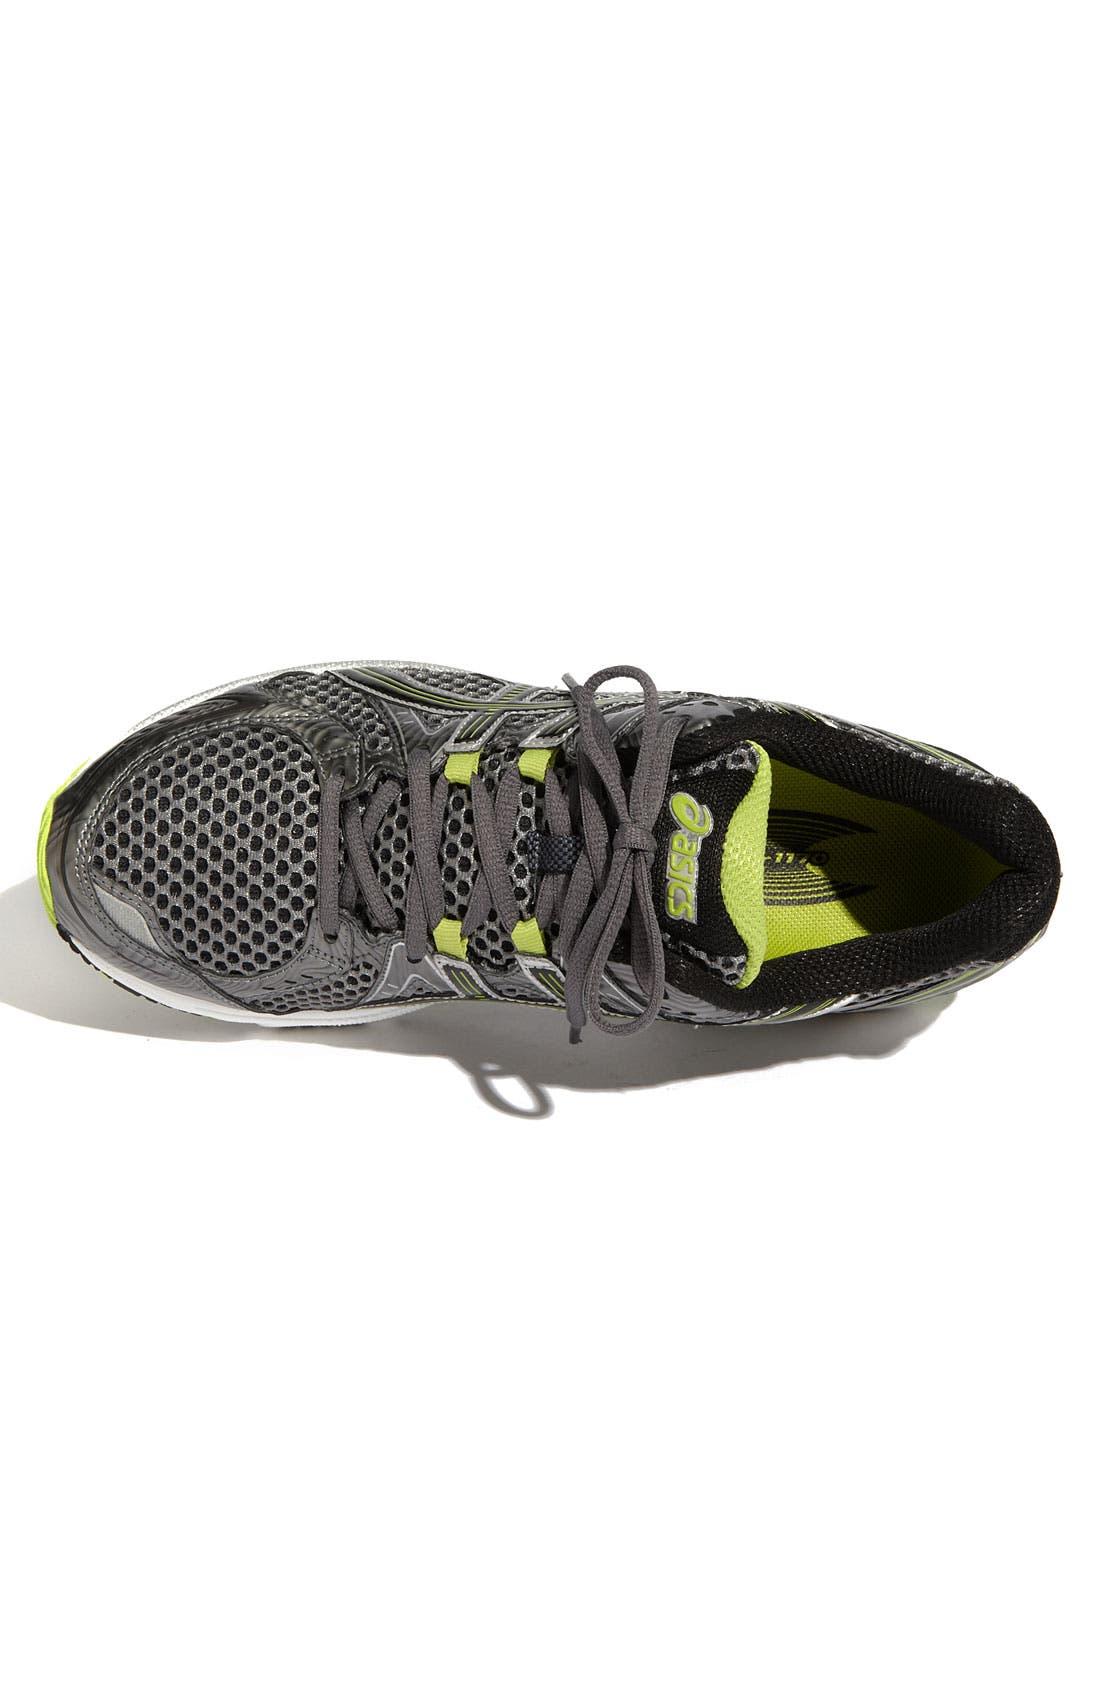 Alternate Image 2  - ASICS® 'Gel-1170™' Running Shoe (Men)